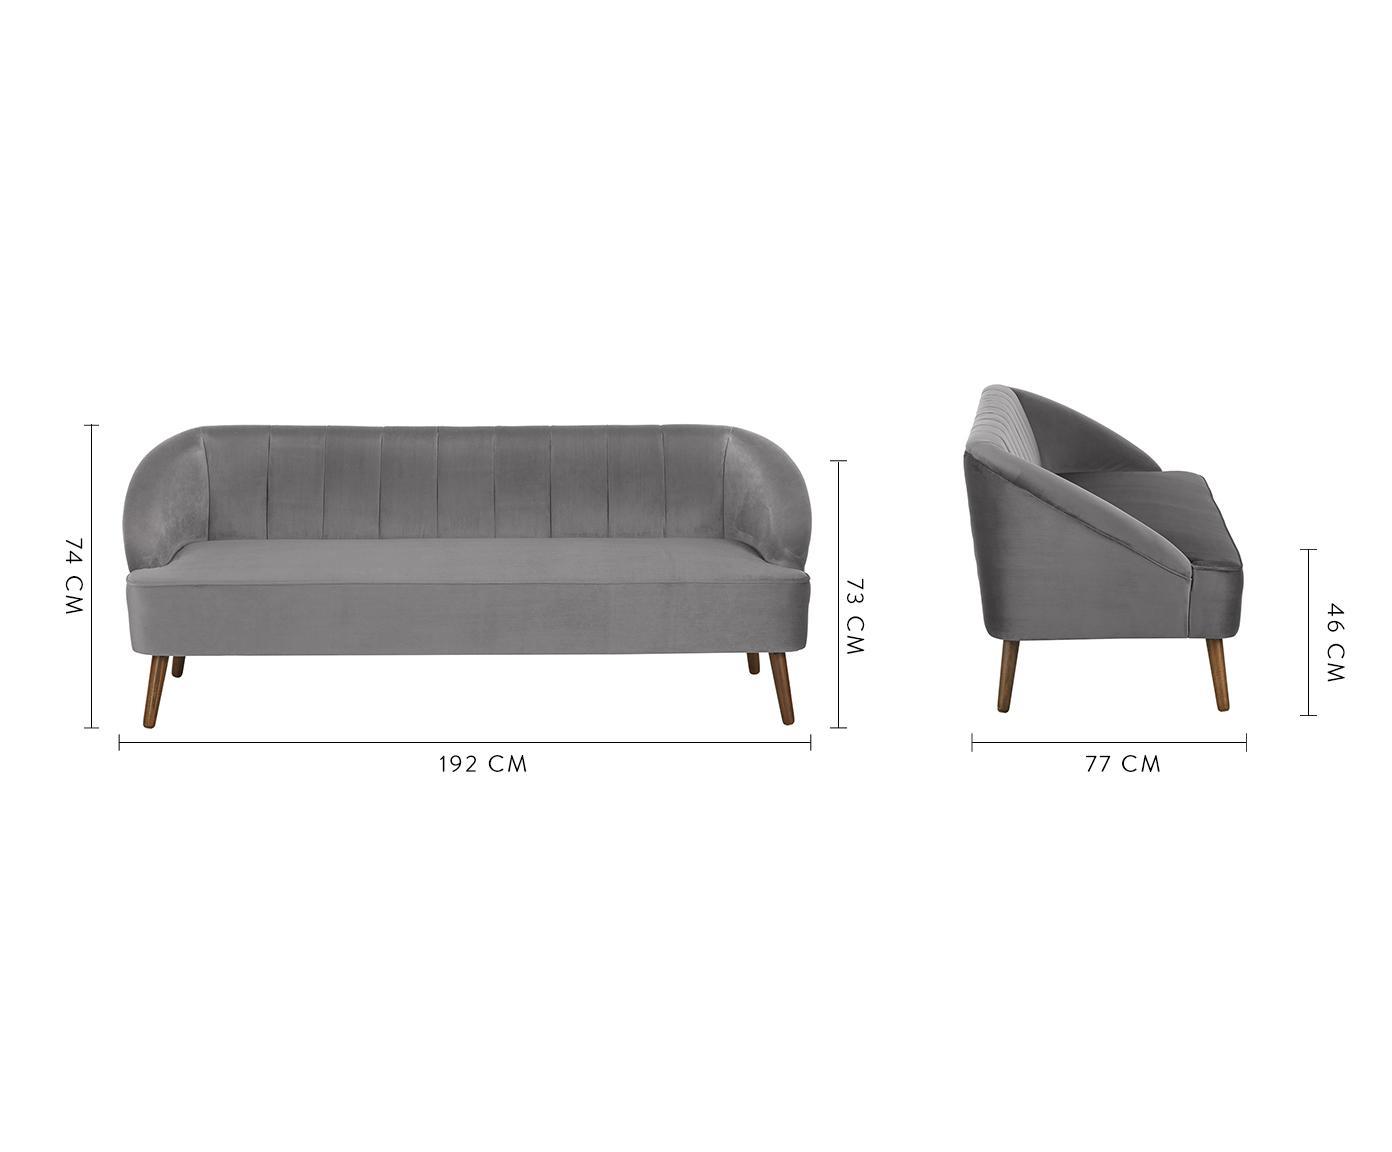 Samt-Sofa Cora (3-Sitzer), Bezug: Samt (Polyester) 28.000 S, Gestell: Kiefernholz, Füße: Kautschukholz, Samt Hellgrau, 192 x 74 cm